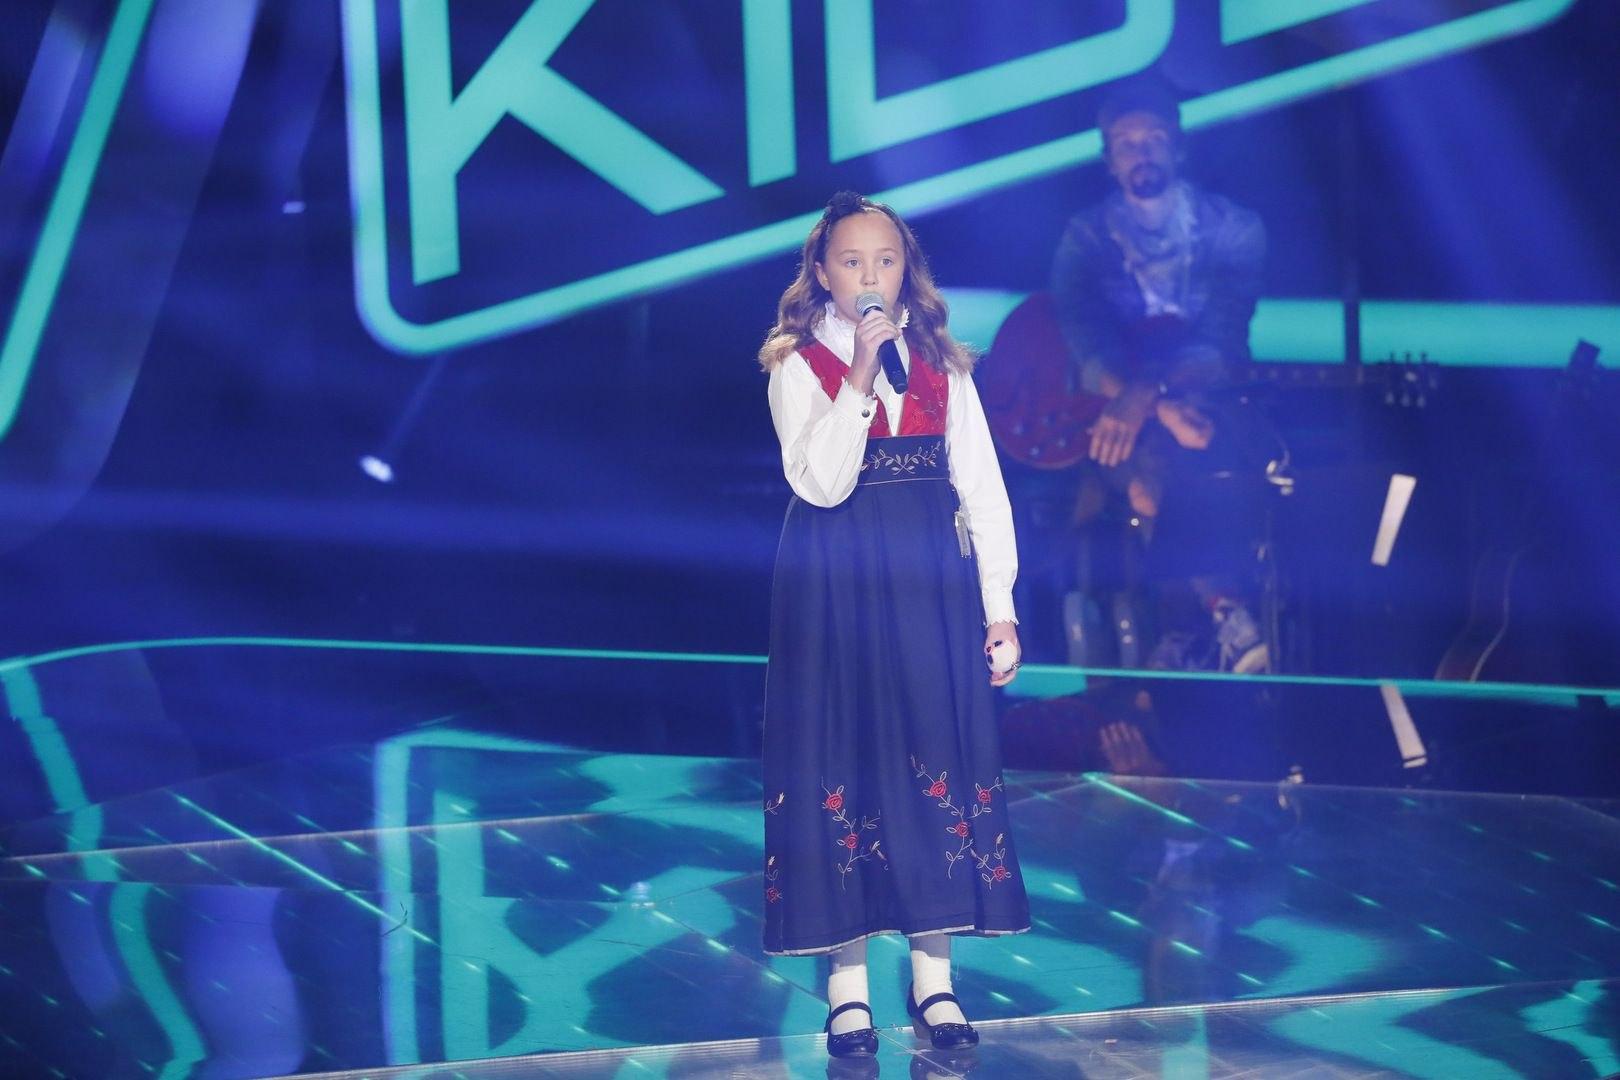 Zoé-Loes: Blackbird  - (Blind Audition II) The Voice Kids 2017 | SAT1.DE